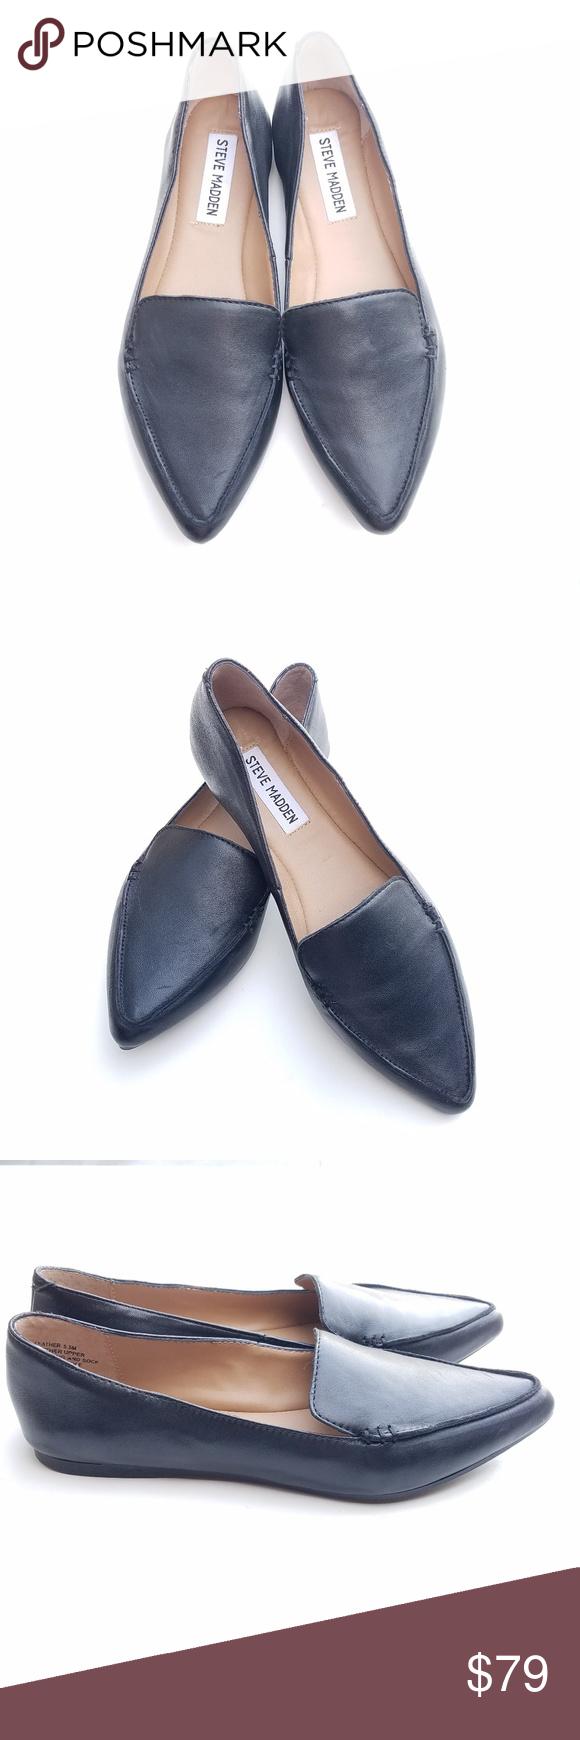 Steve Madden Black Leather Loafers Size